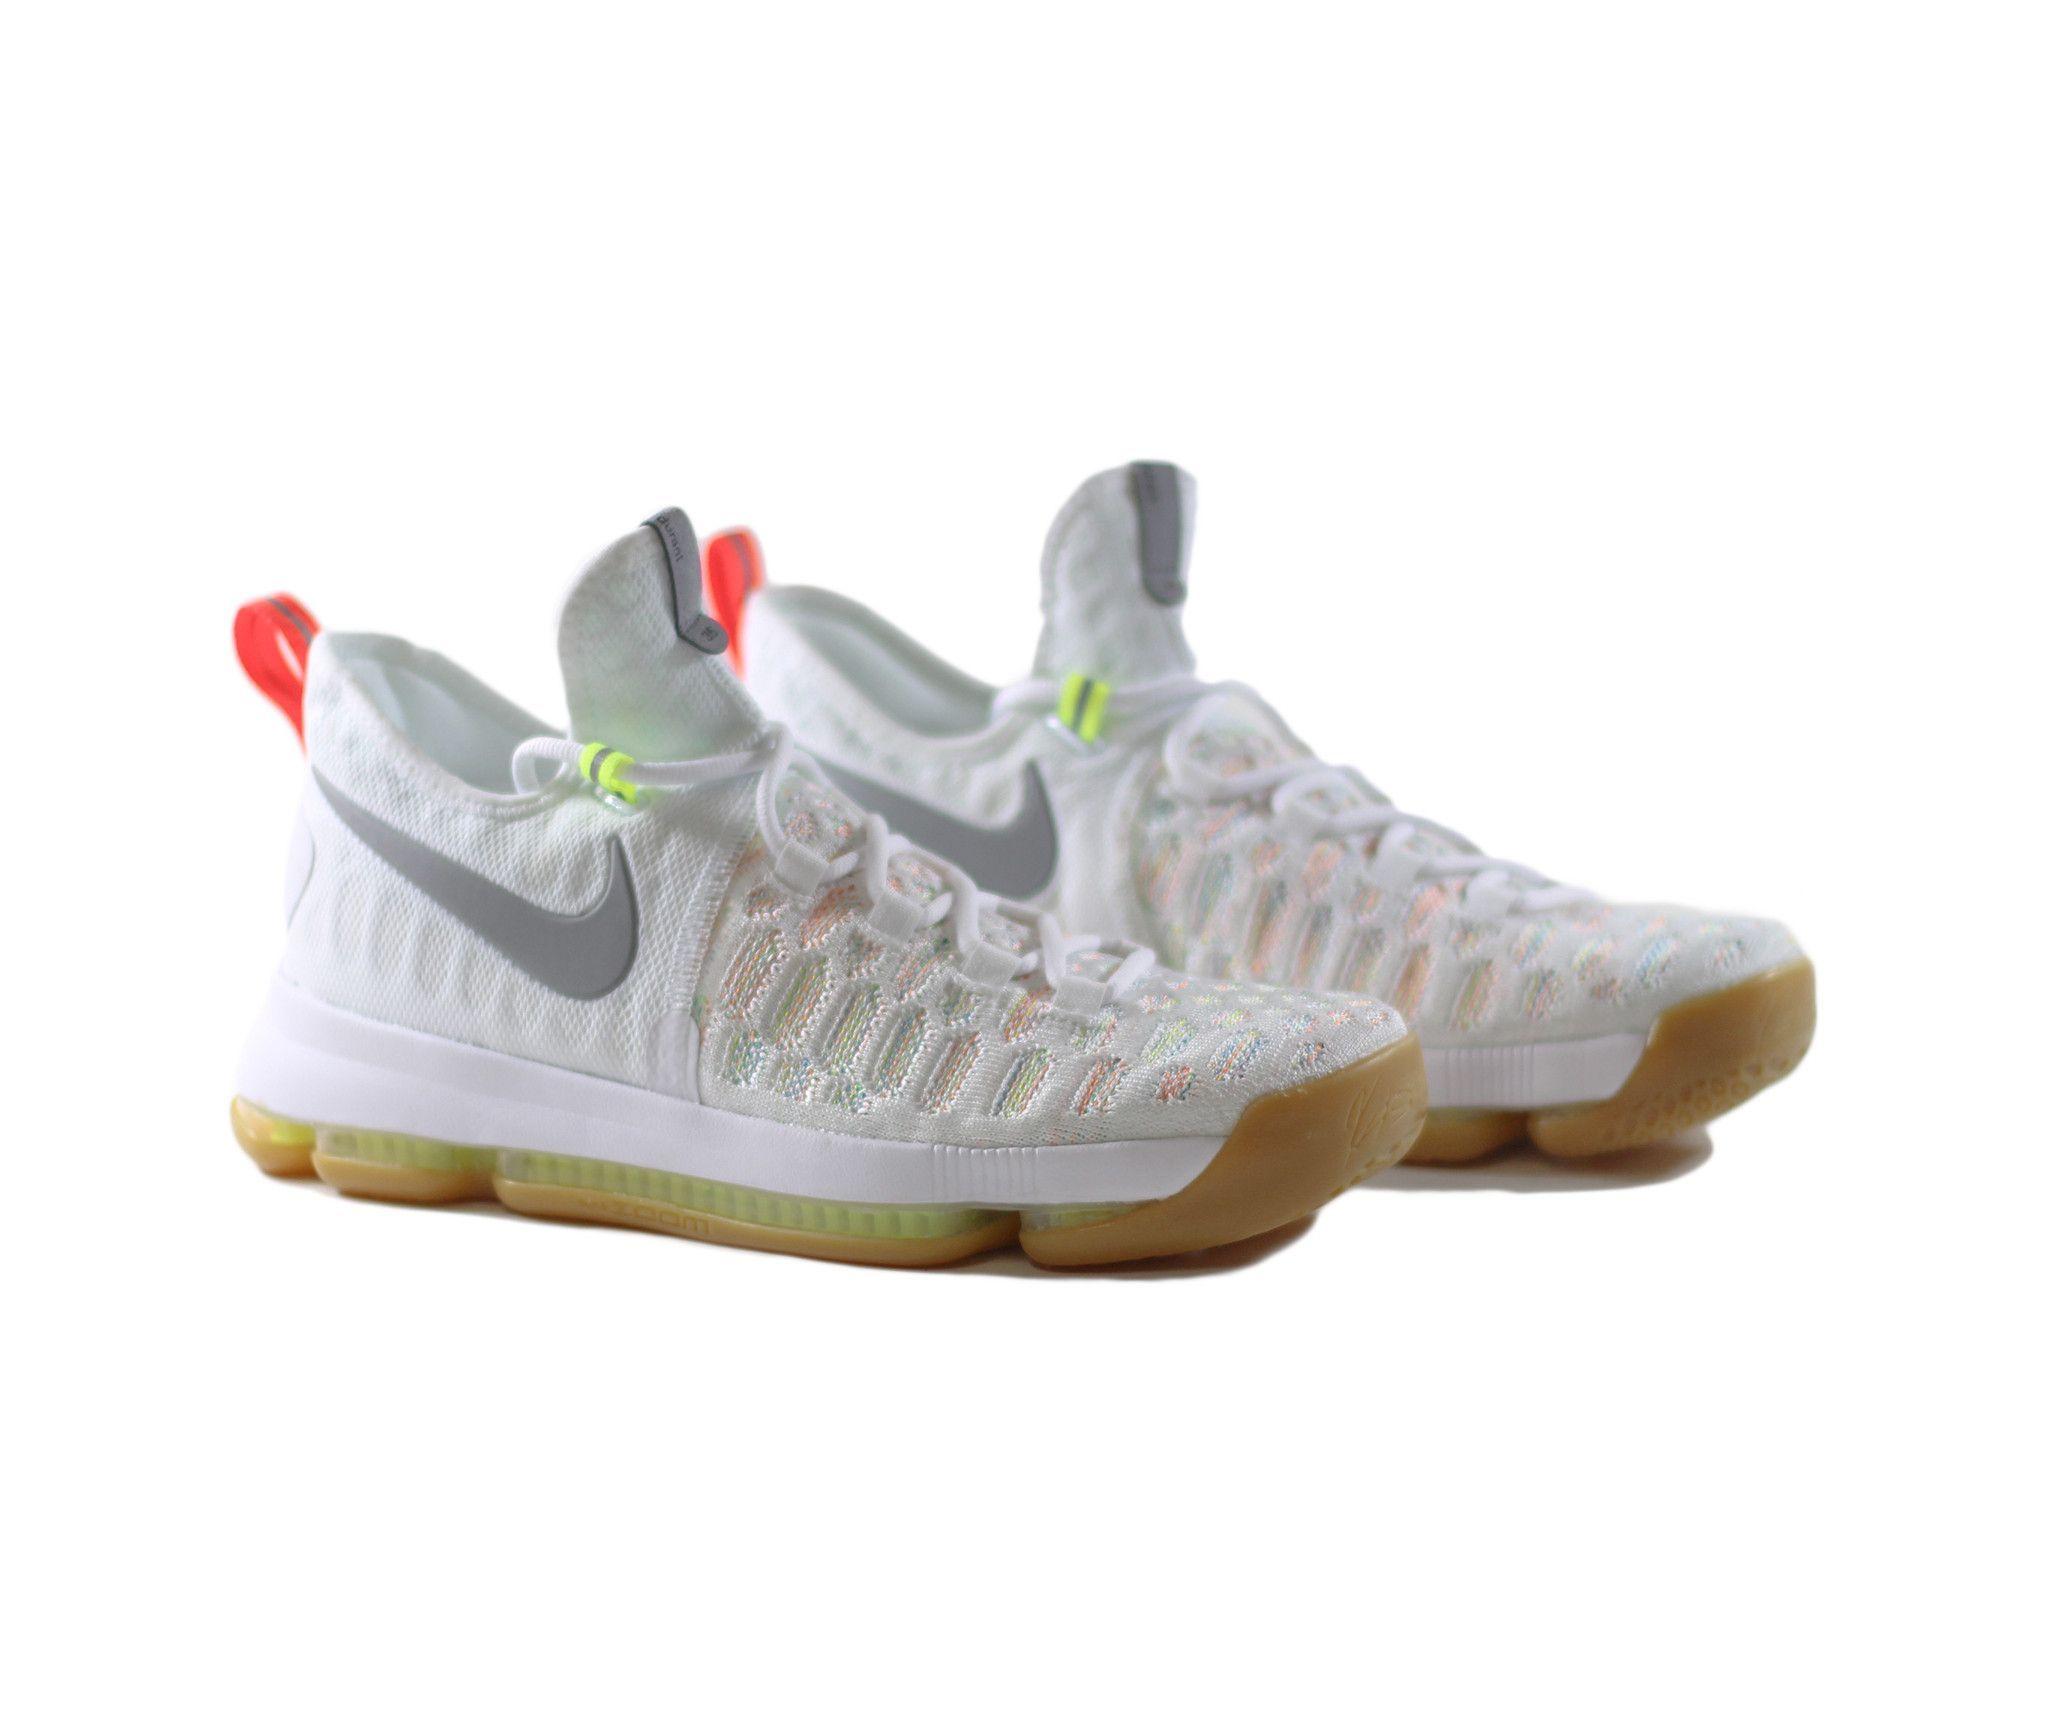 Nike KD granate